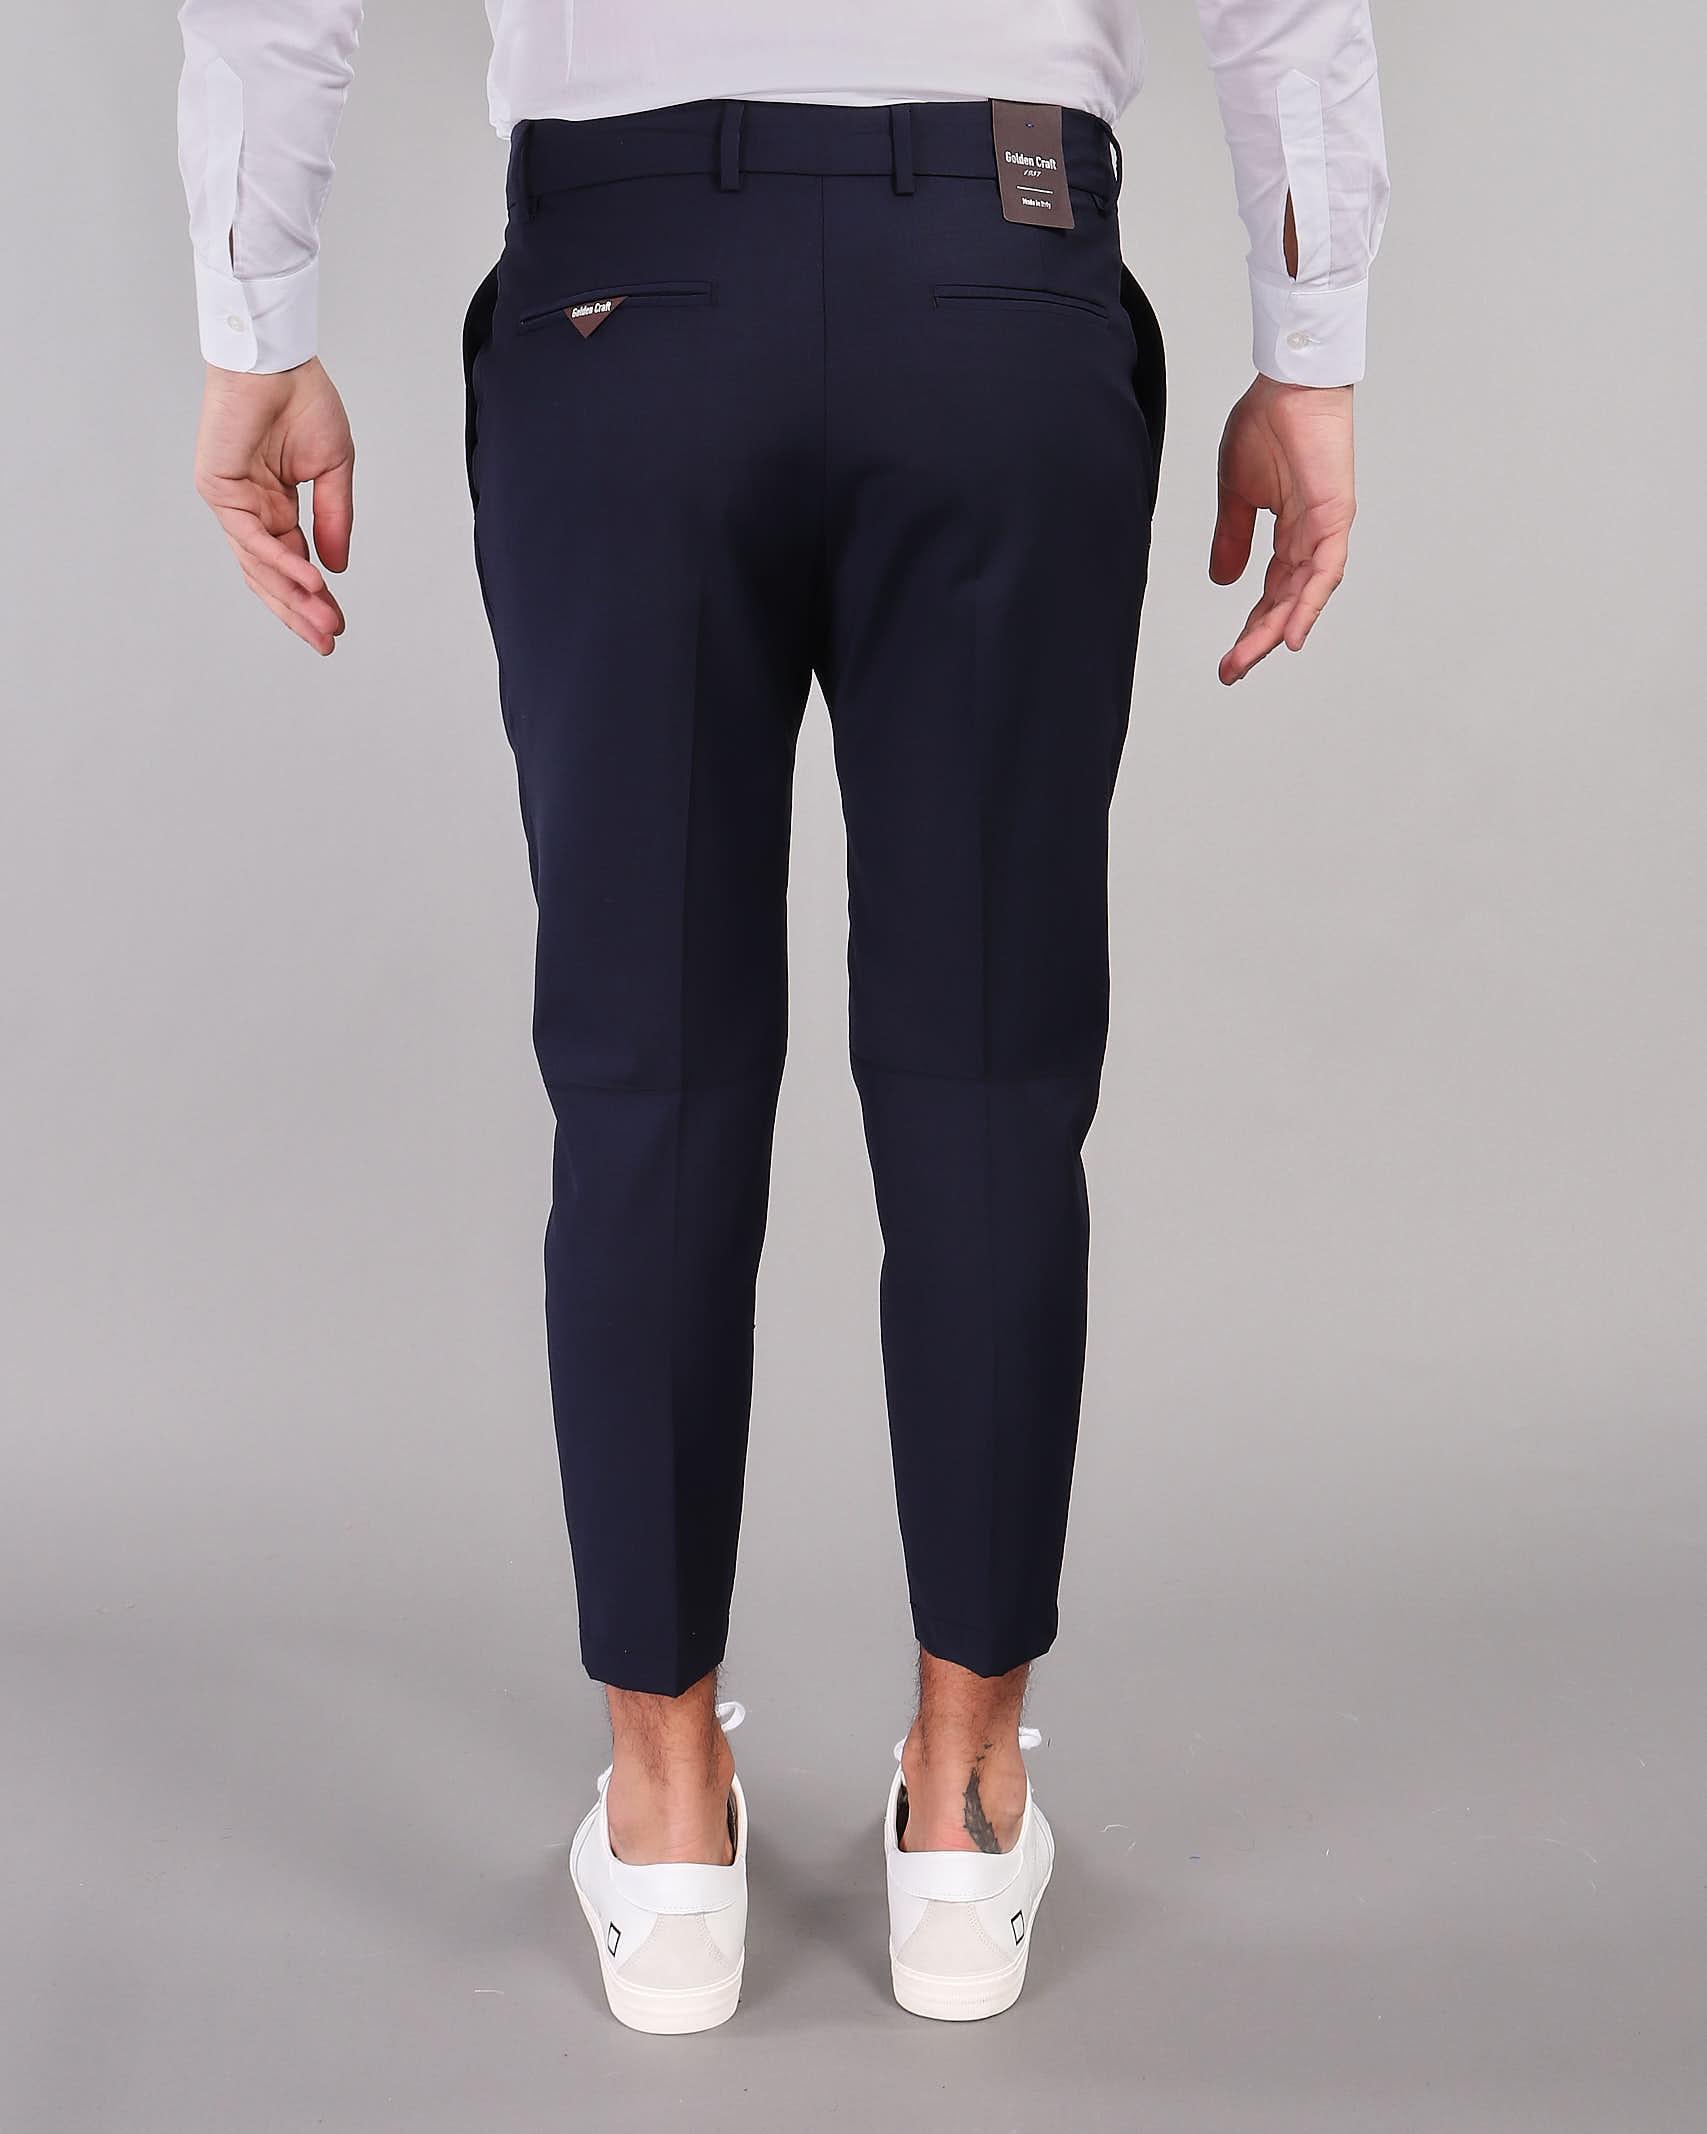 Pantalone capri Golden Craft GOLDEN CRAFT | Pantalone | GC1PSS215890E044